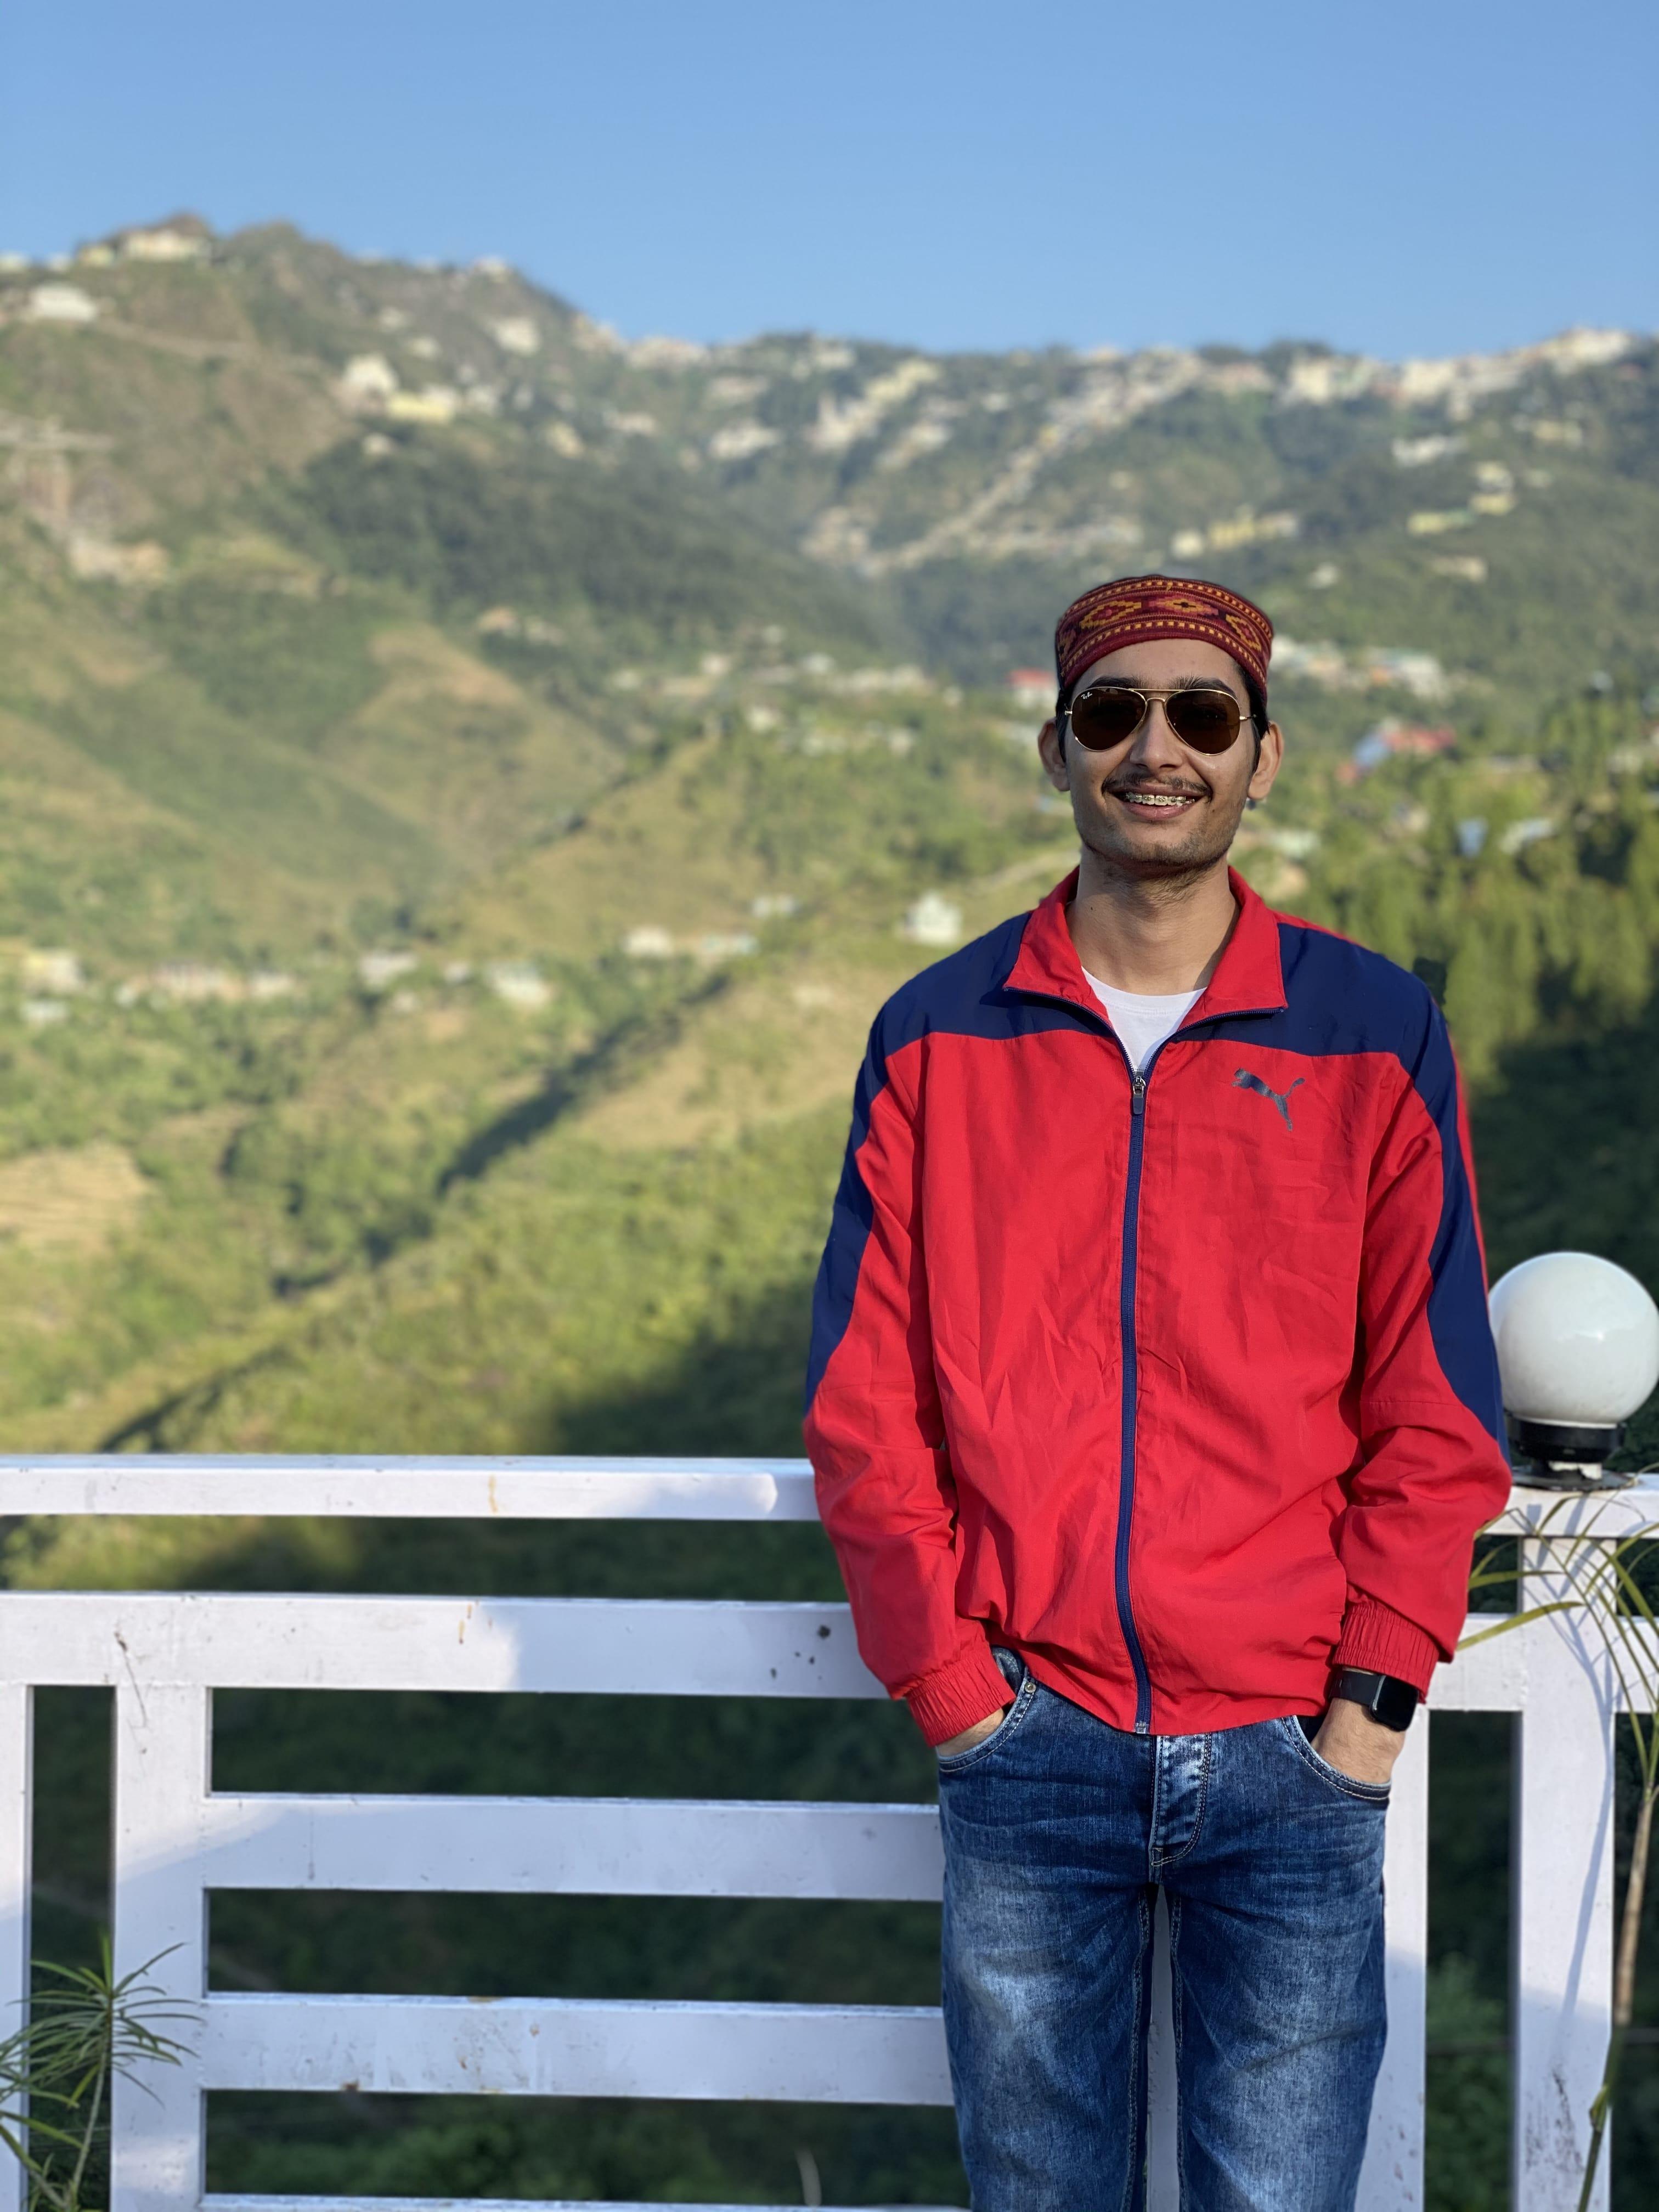 Ravinder Payal